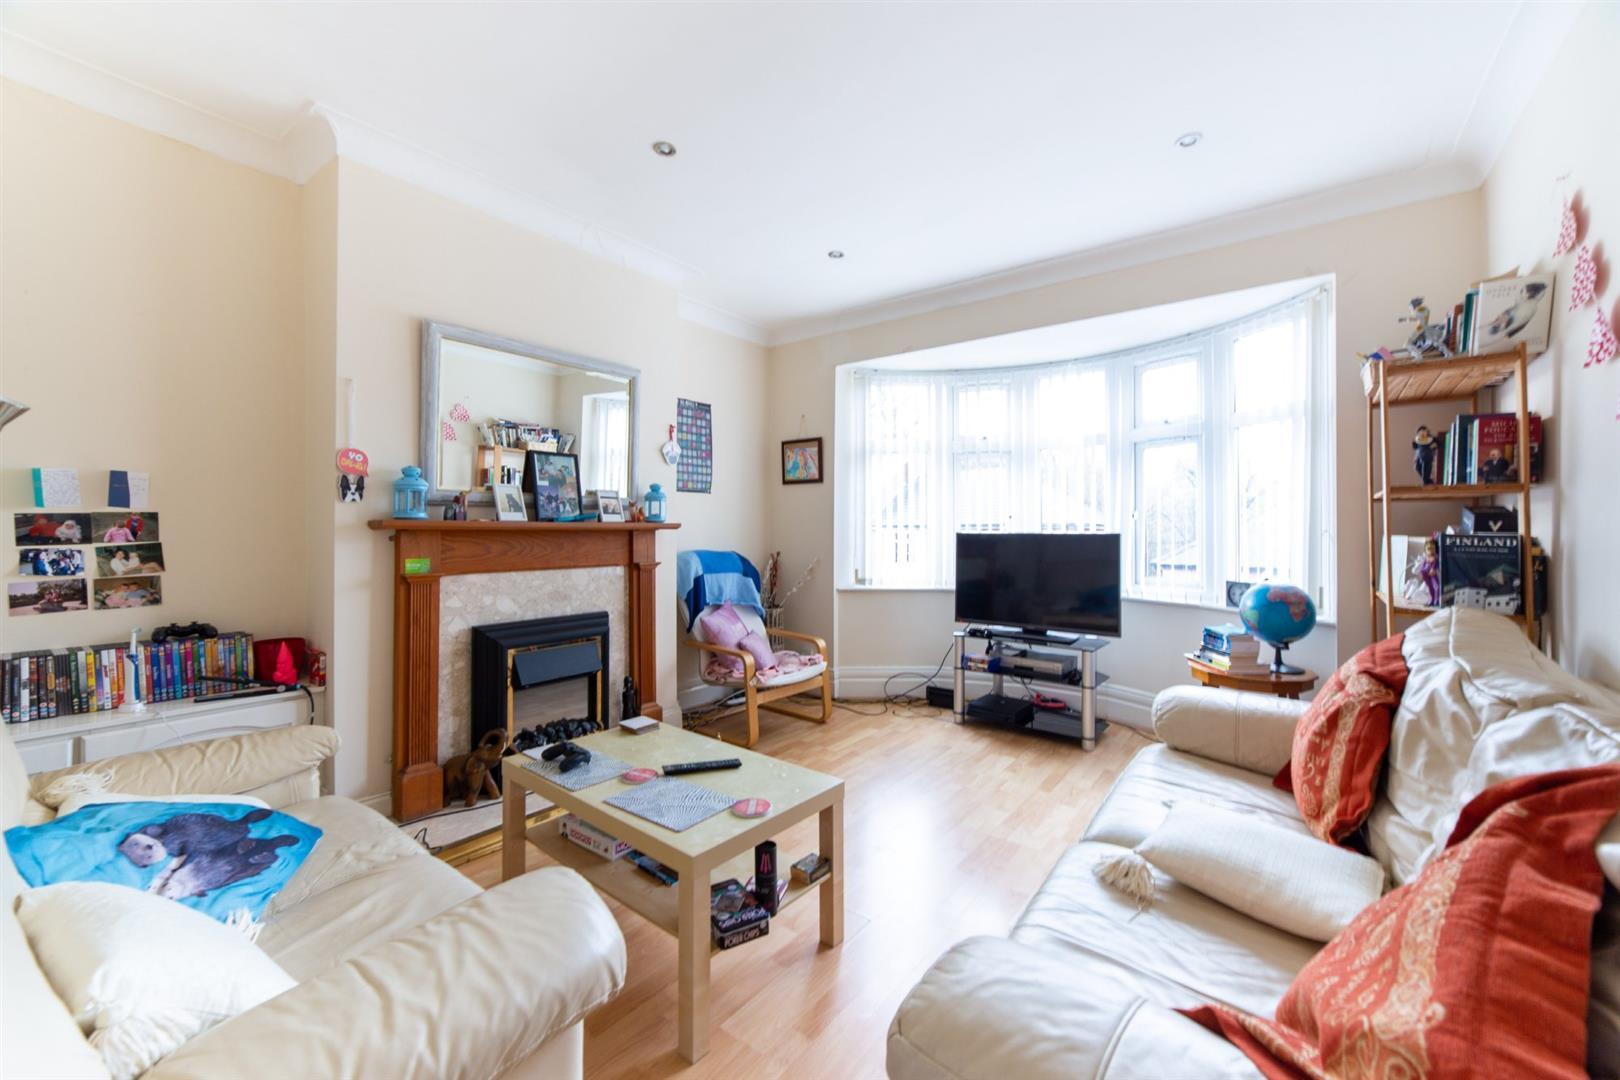 3 bed flat to rent in Shaftesbury Grove, Heaton, NE6